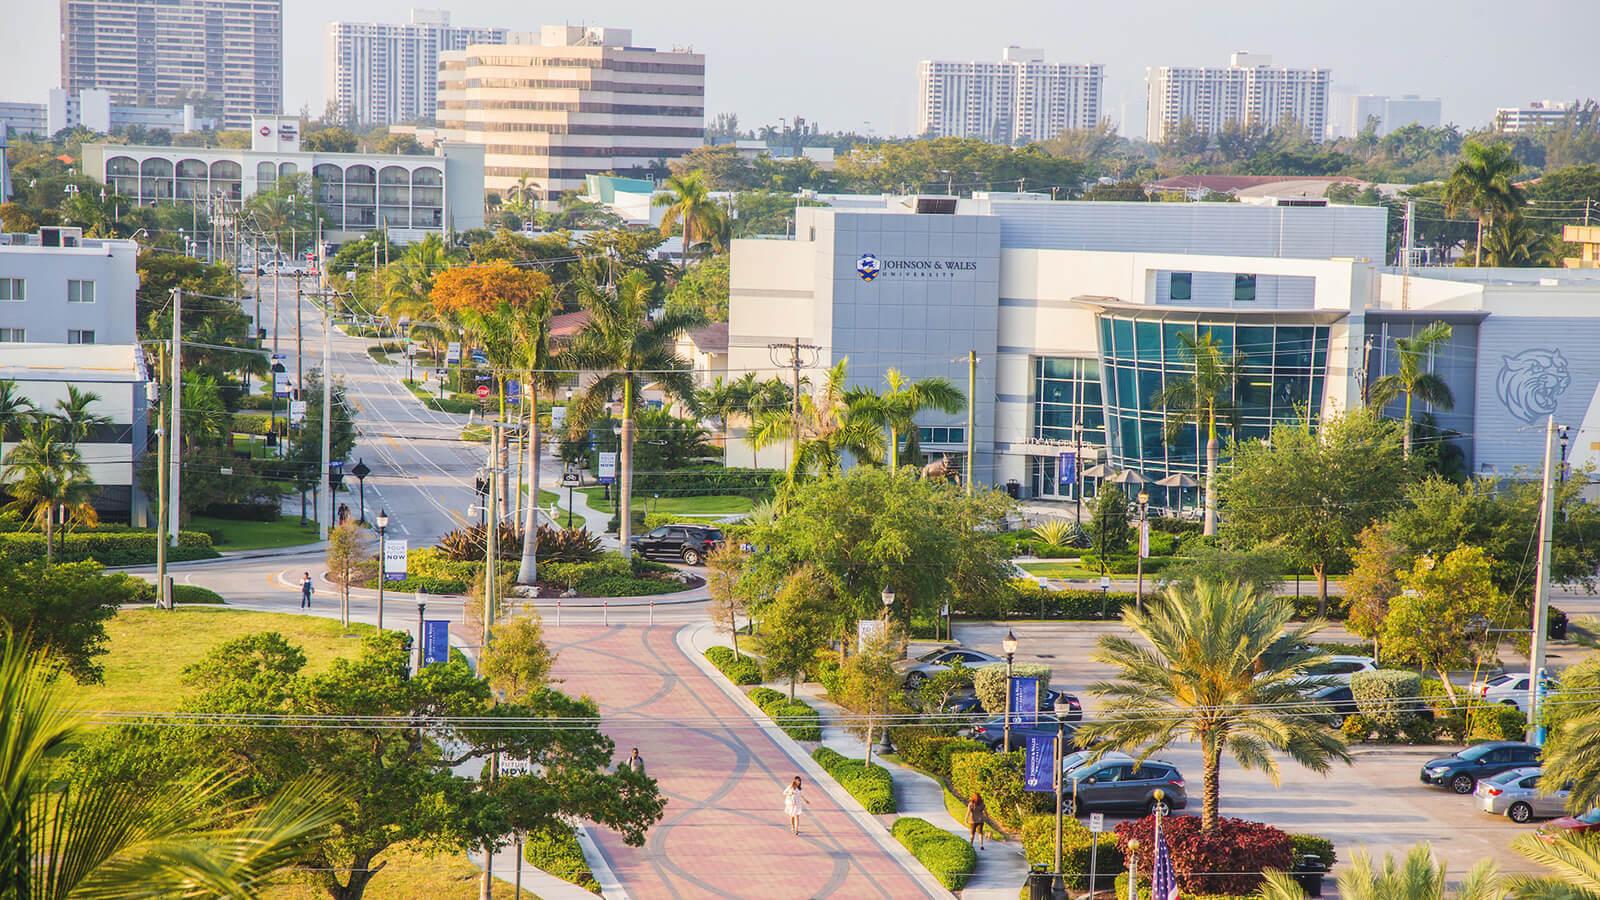 Johnson And Wales University Miami >> Johnson Wales University North Miami Cappex